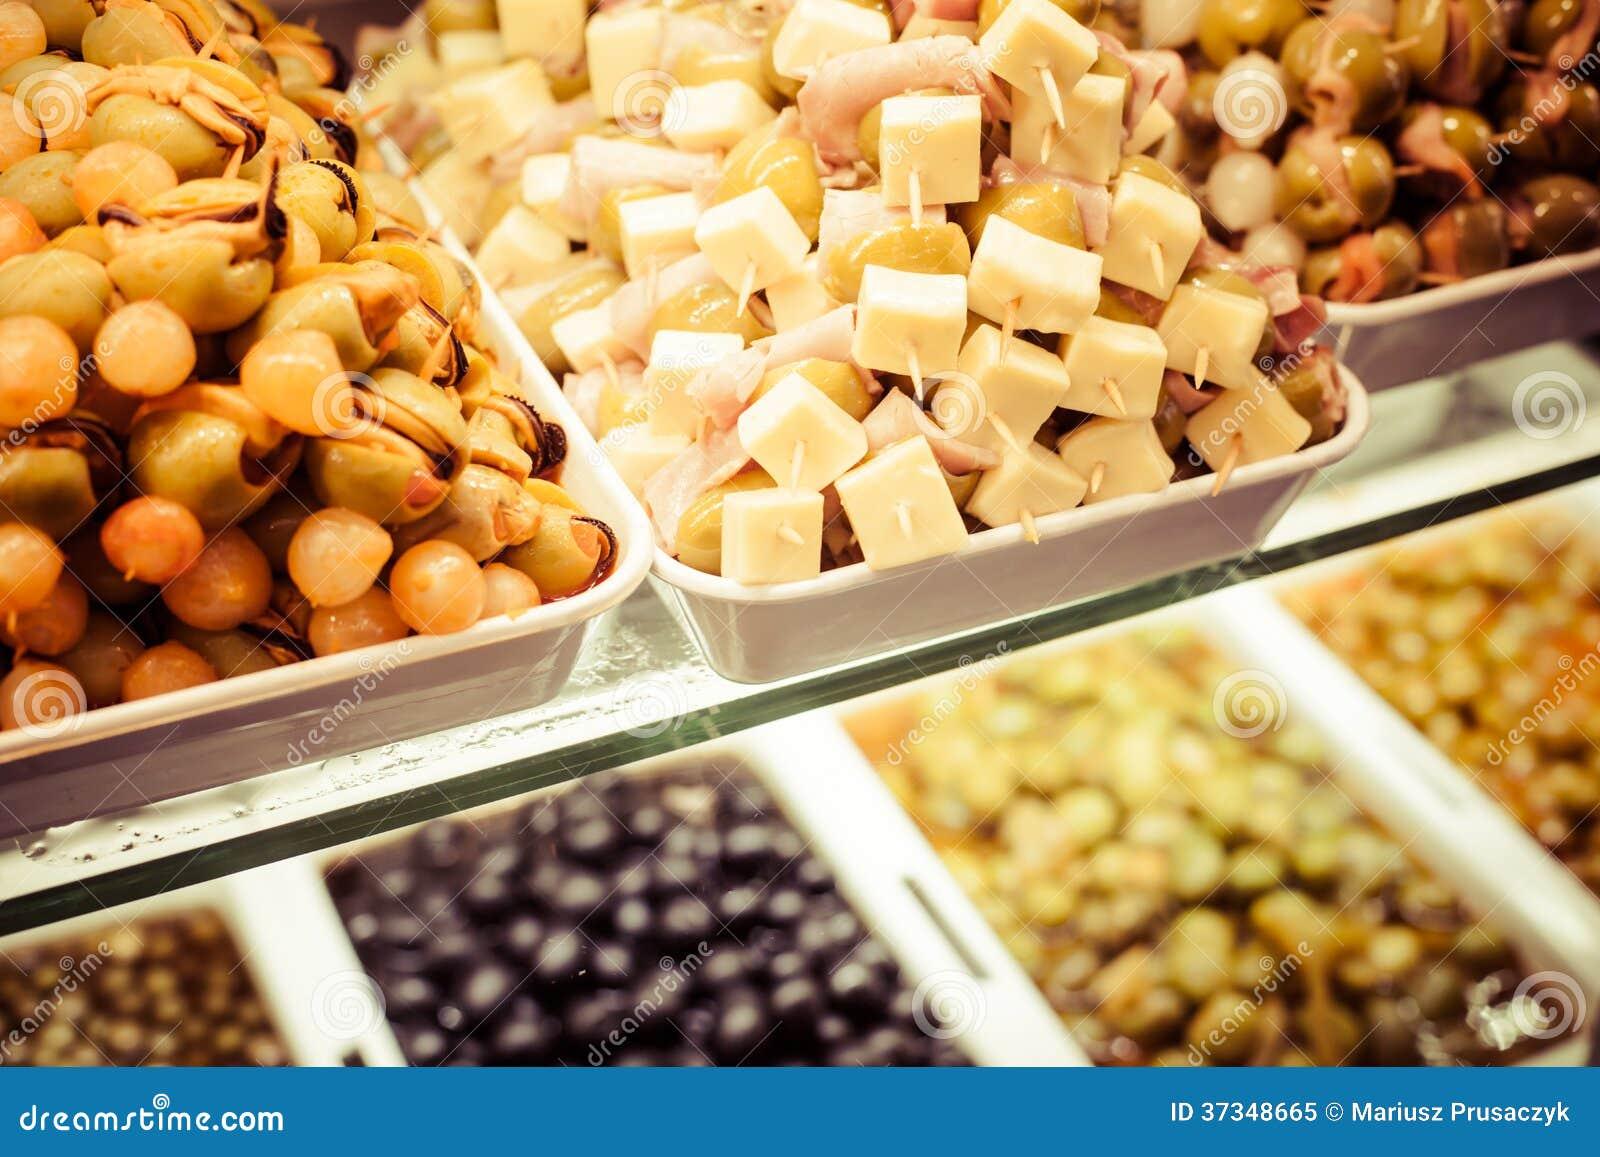 Typisk spansk matmarknad.